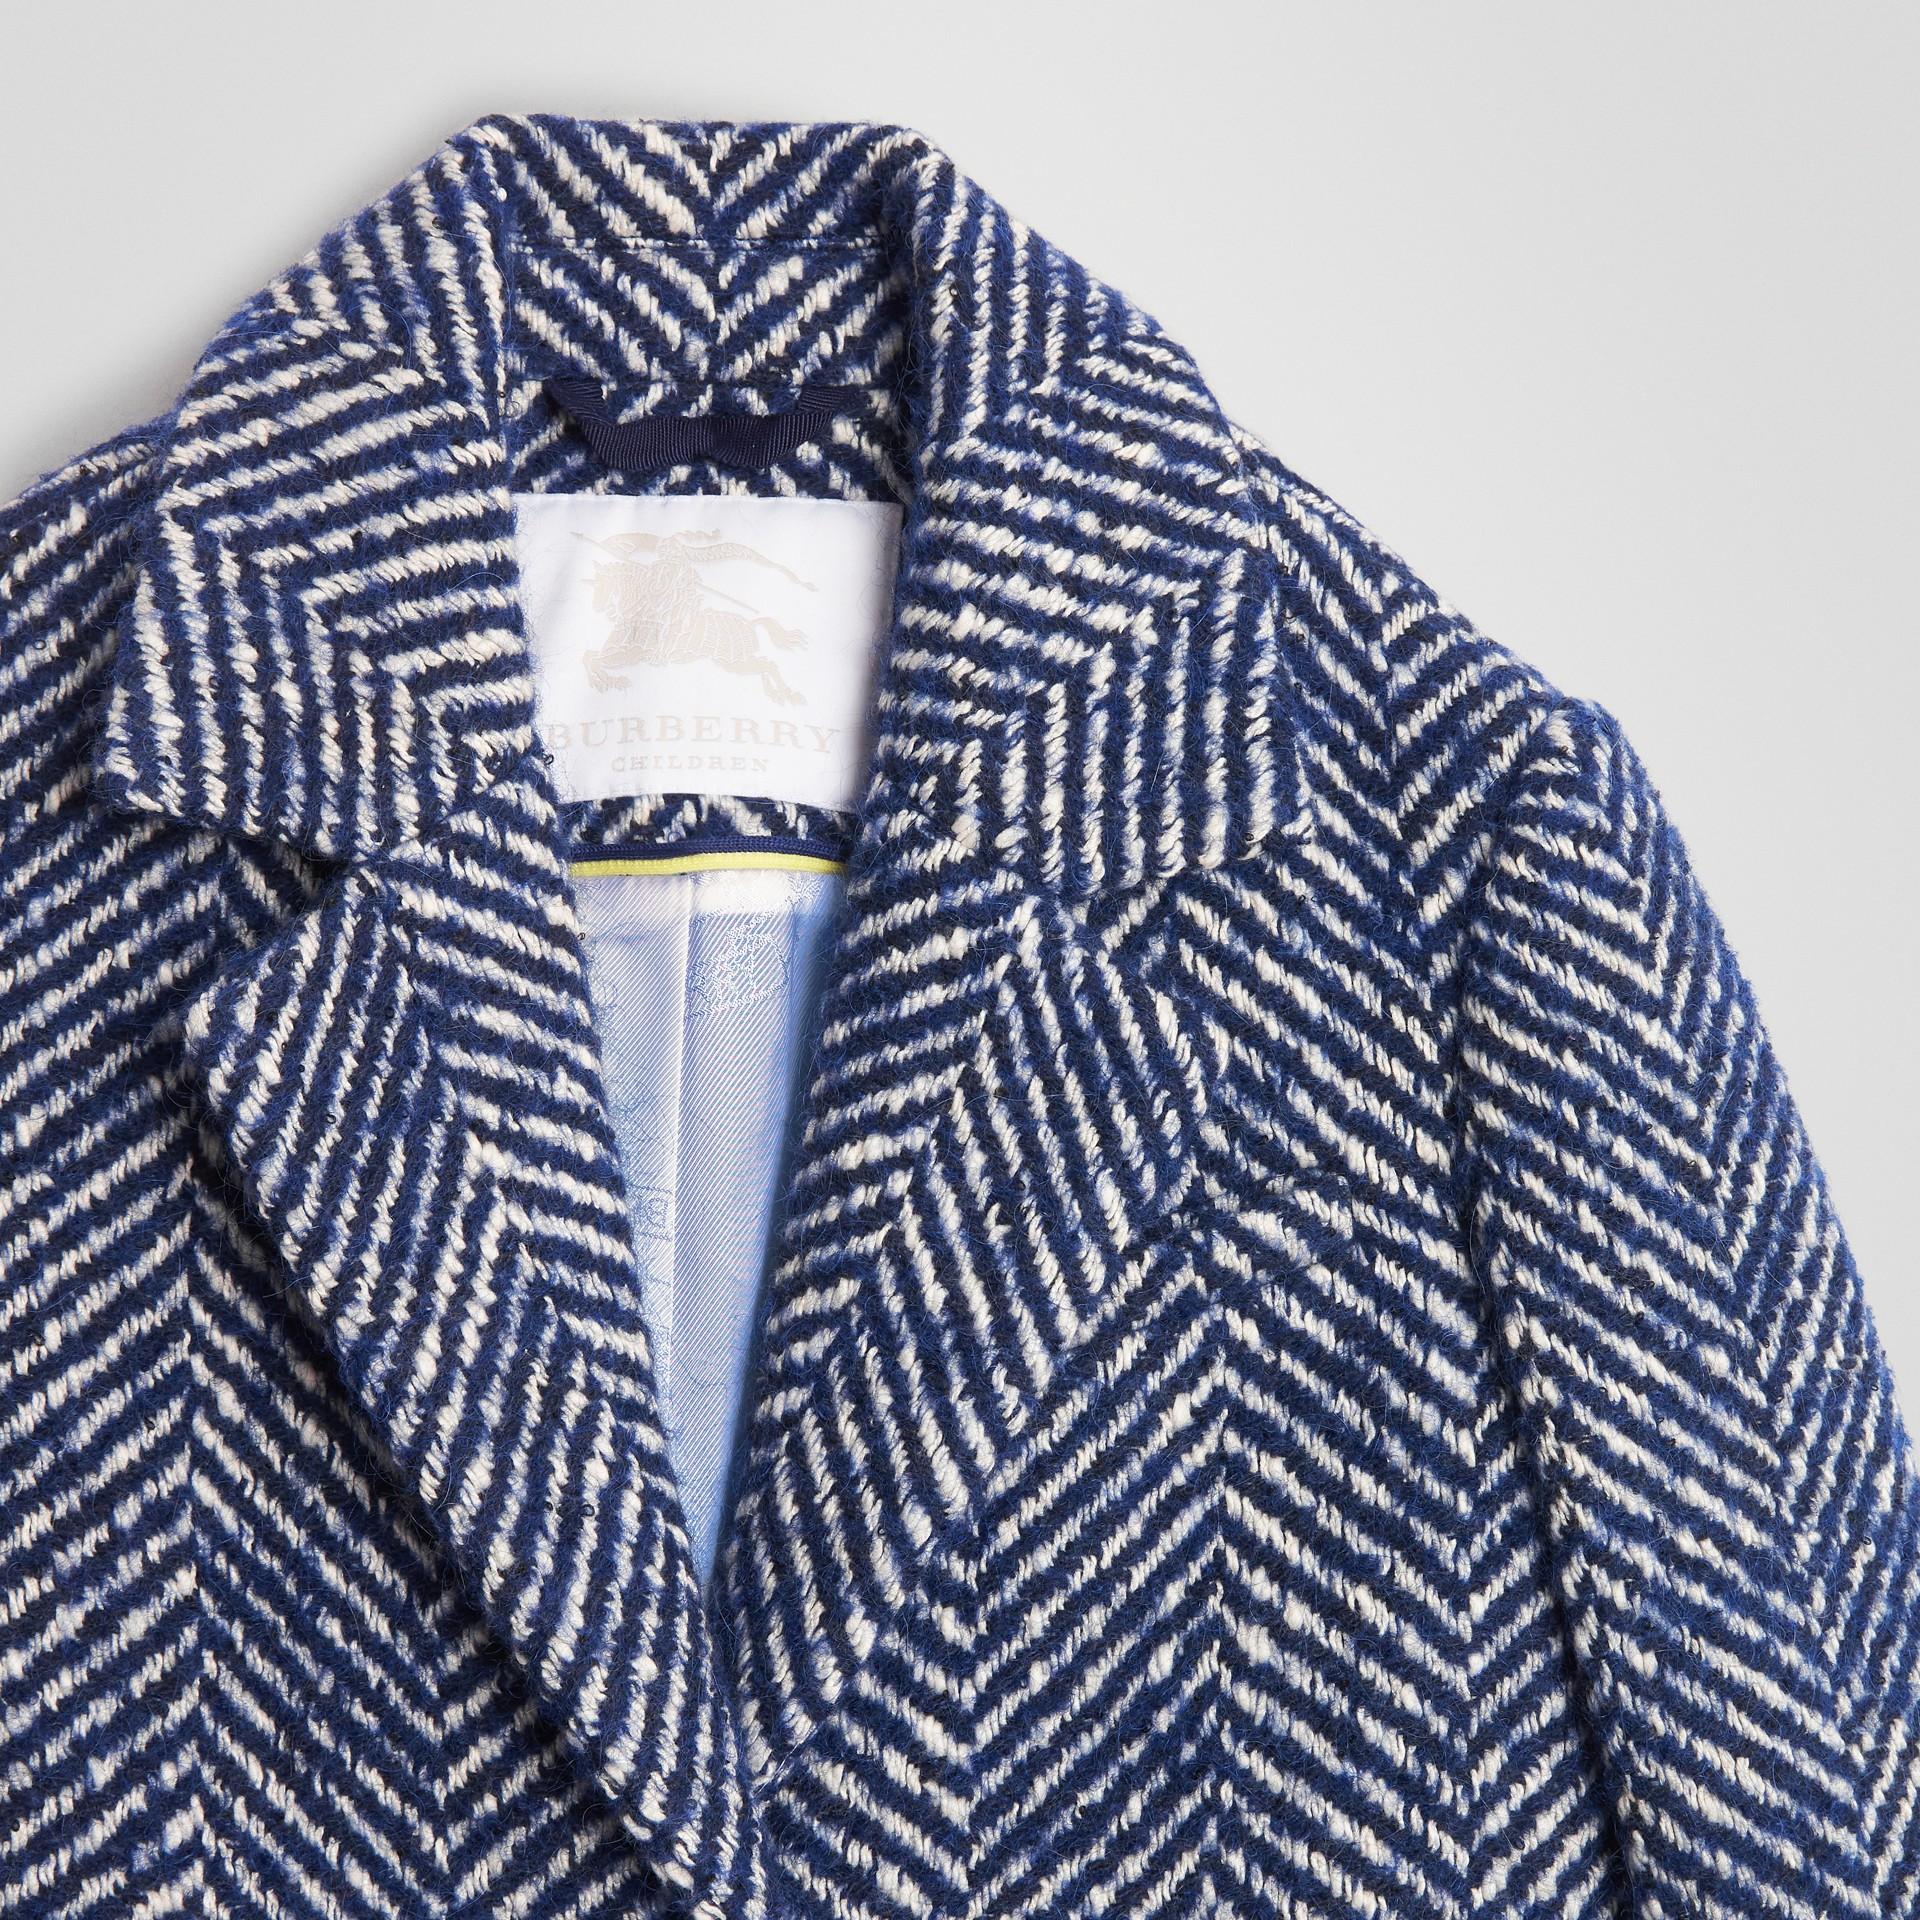 Herringbone Wool Cotton Blend Tailored Coat in Navy - Children | Burberry - gallery image 4